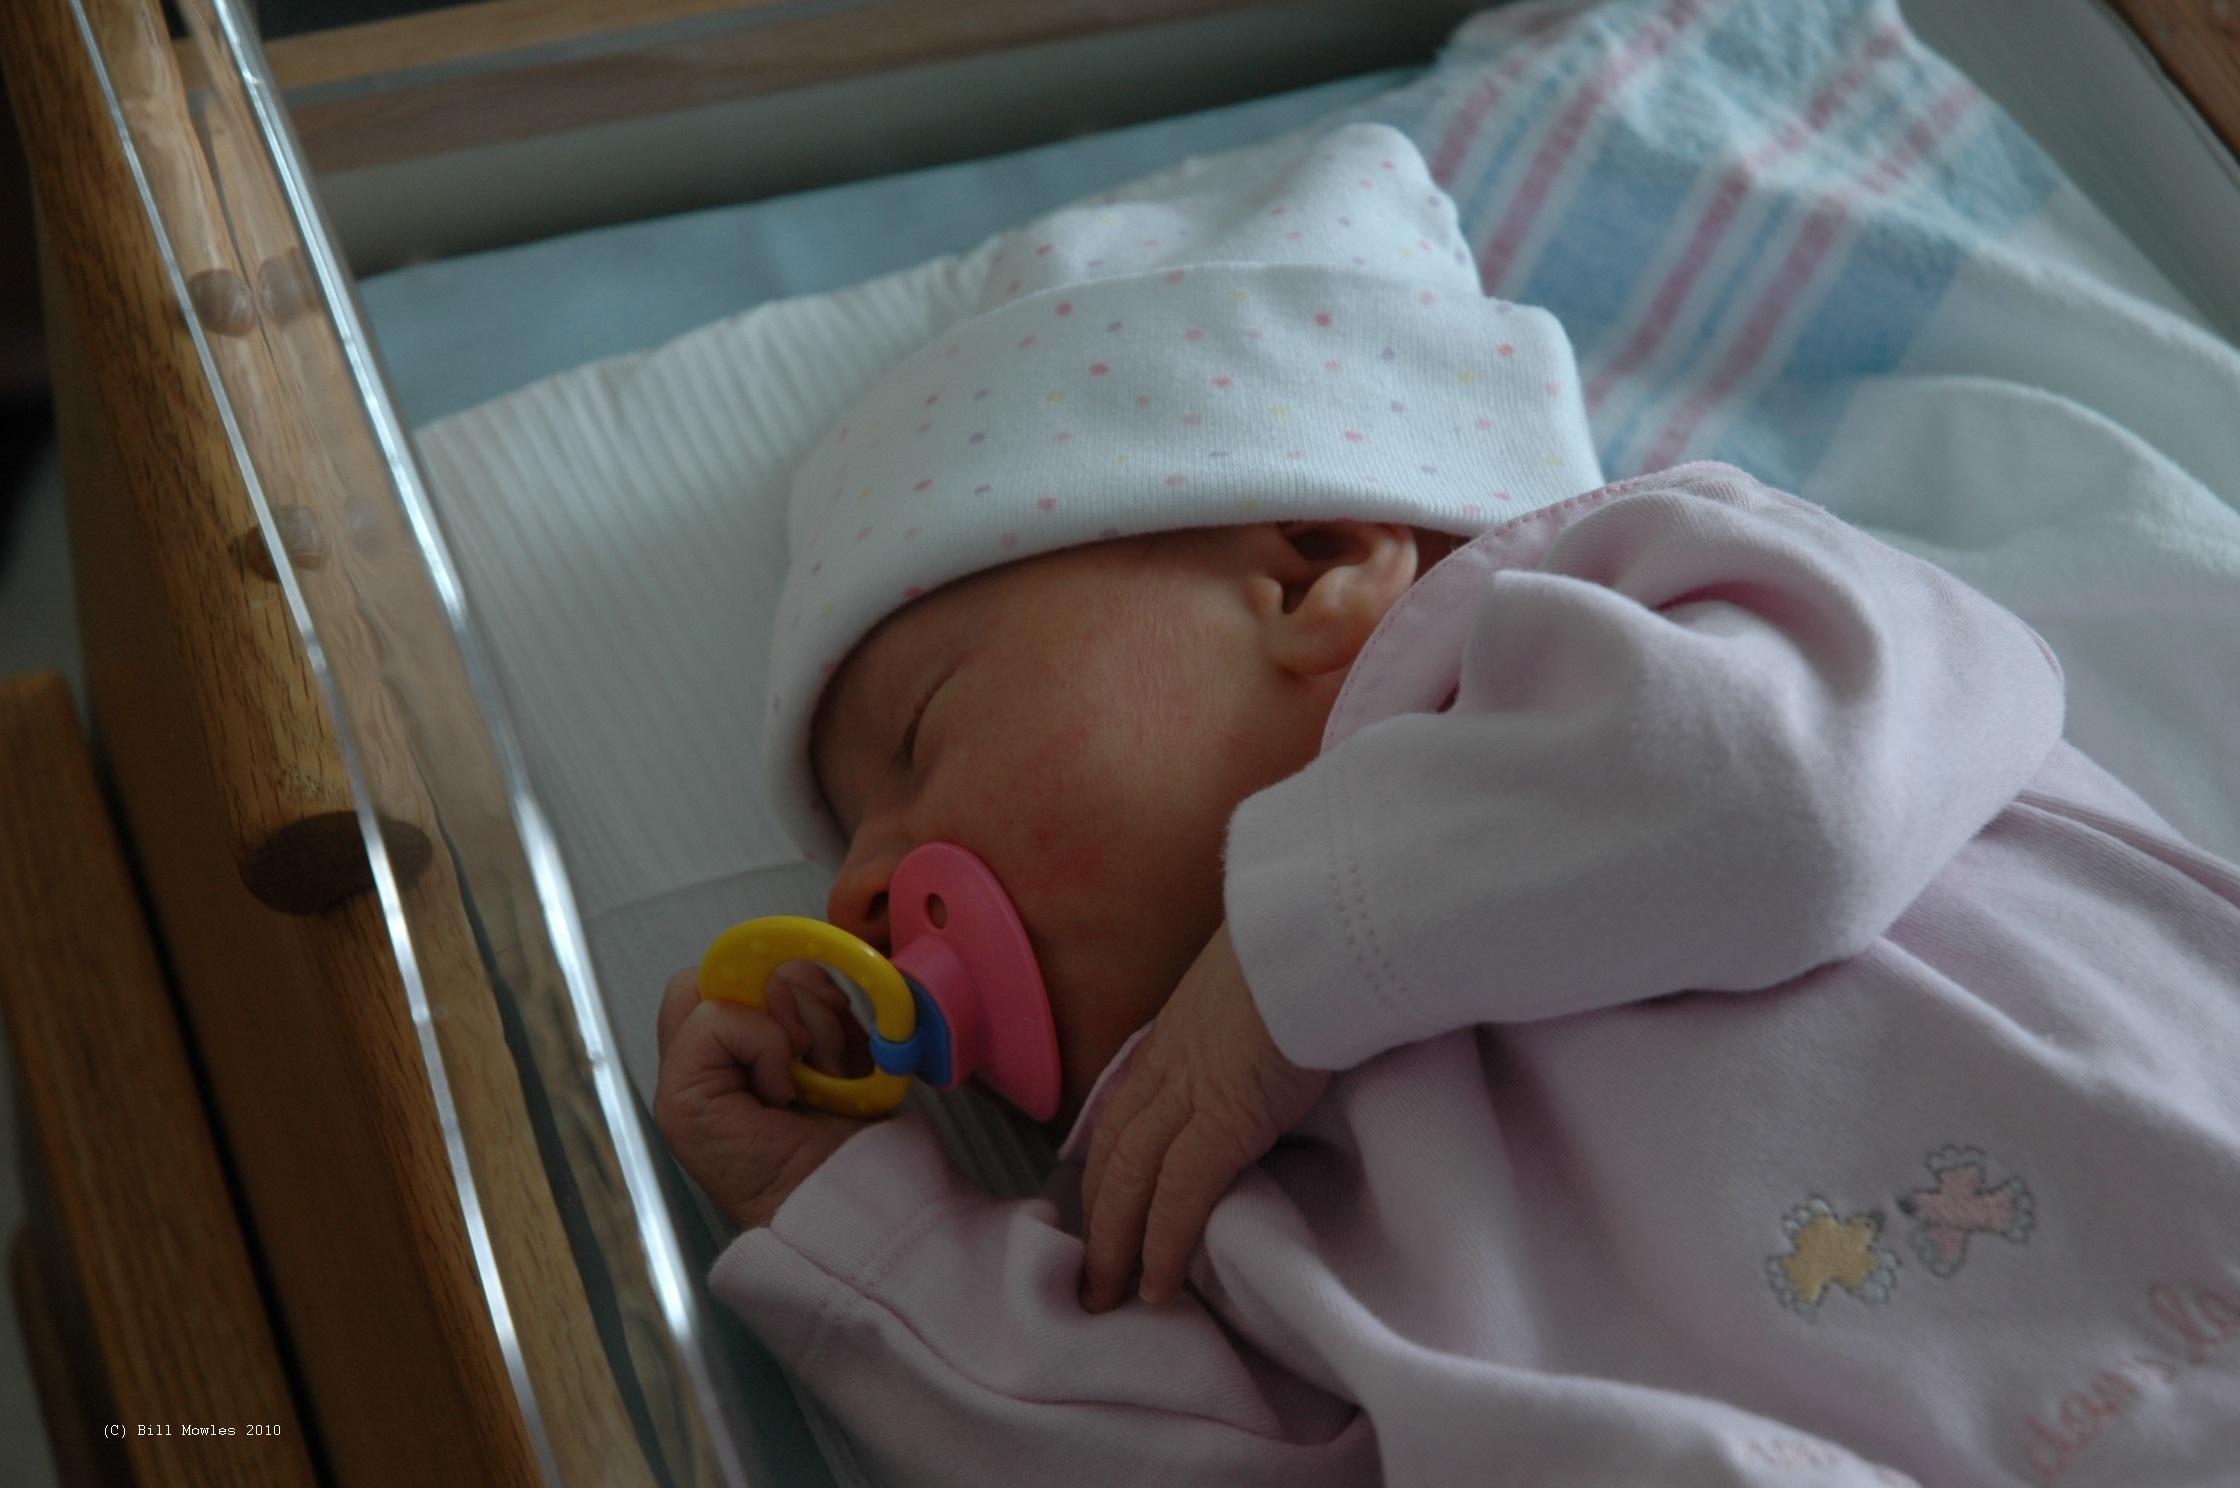 Baby newborn in hospital bassinet (C)